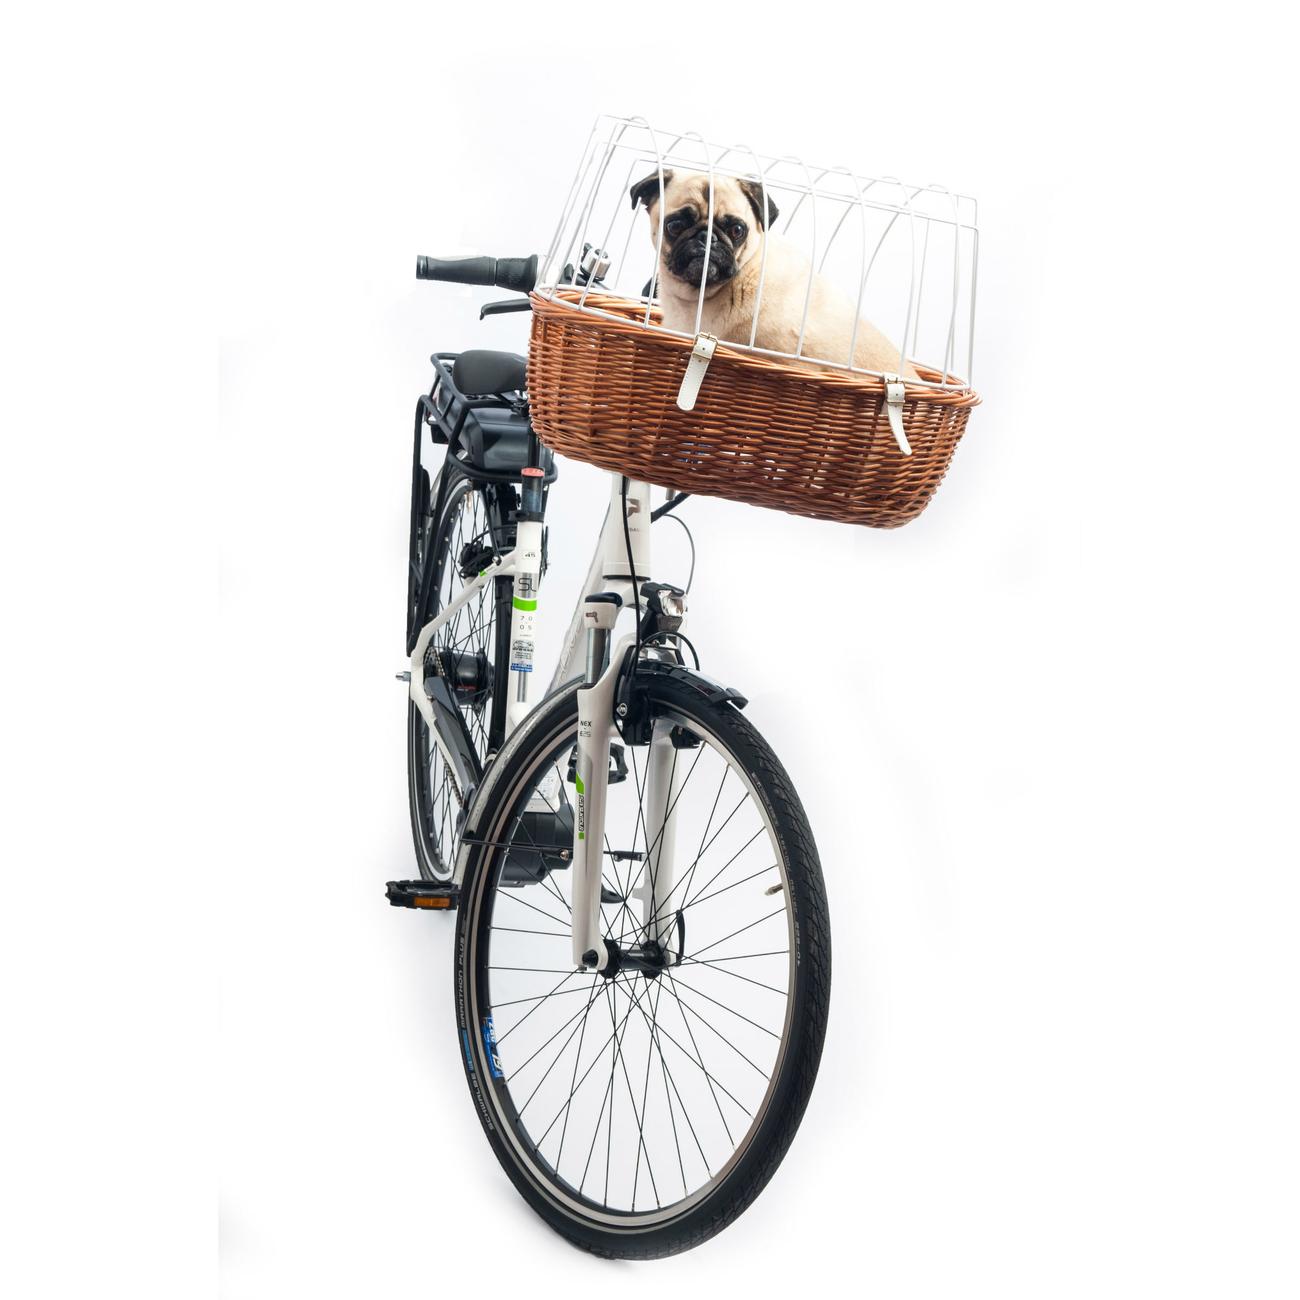 Aumüller E-Bike Hunde Fahrradkorb Standard vorne, Bild 6